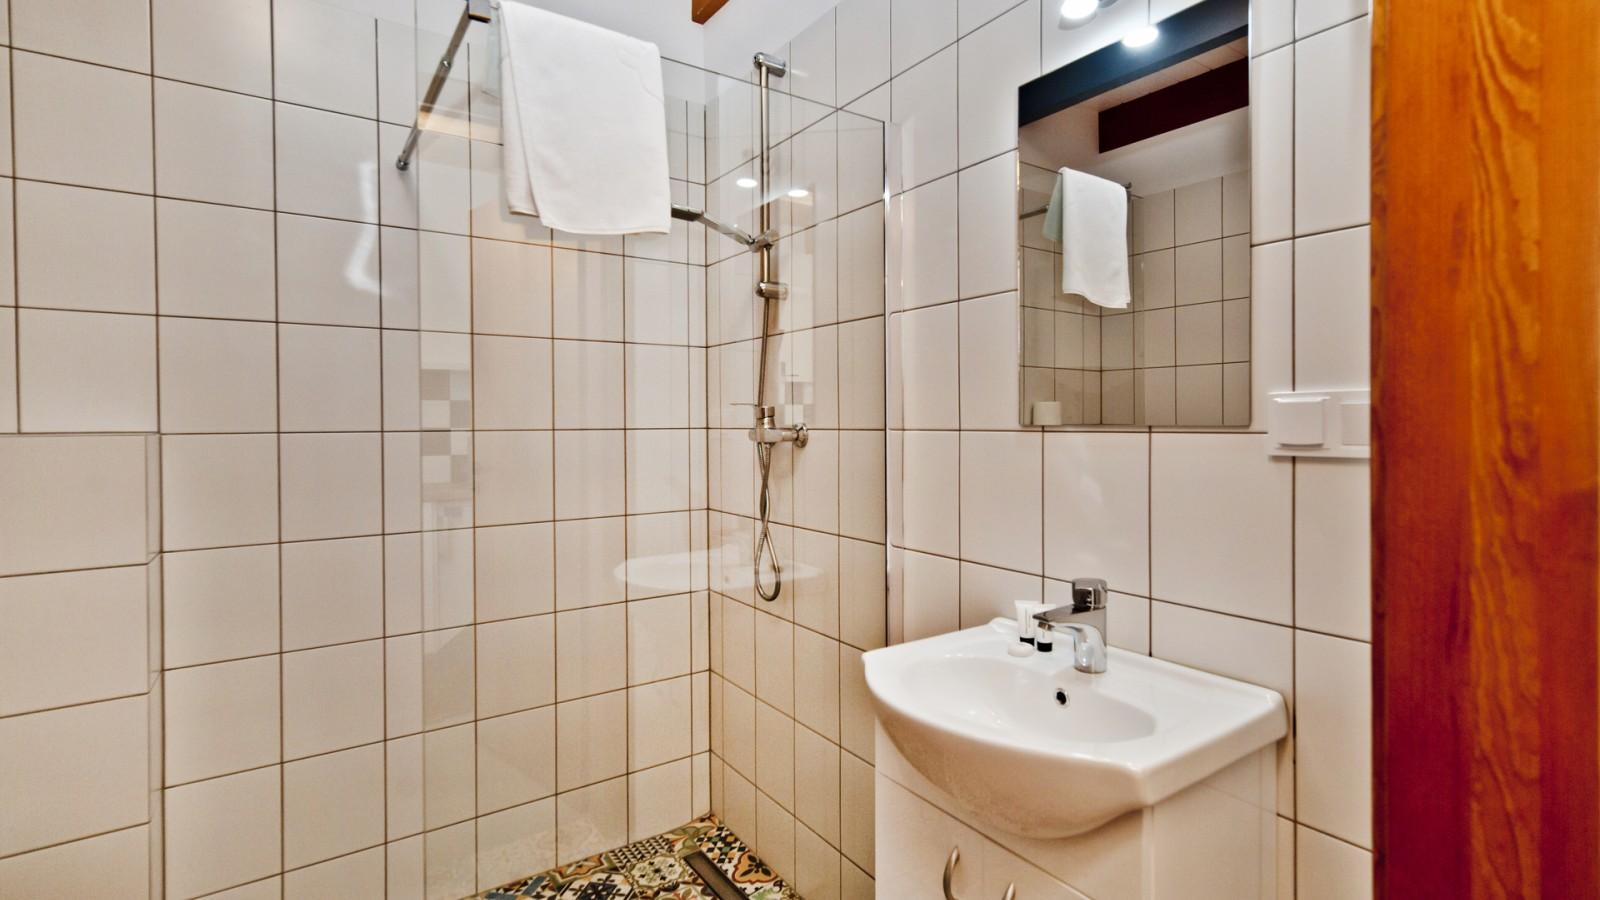 Domek Apartamentowy Scandi 2